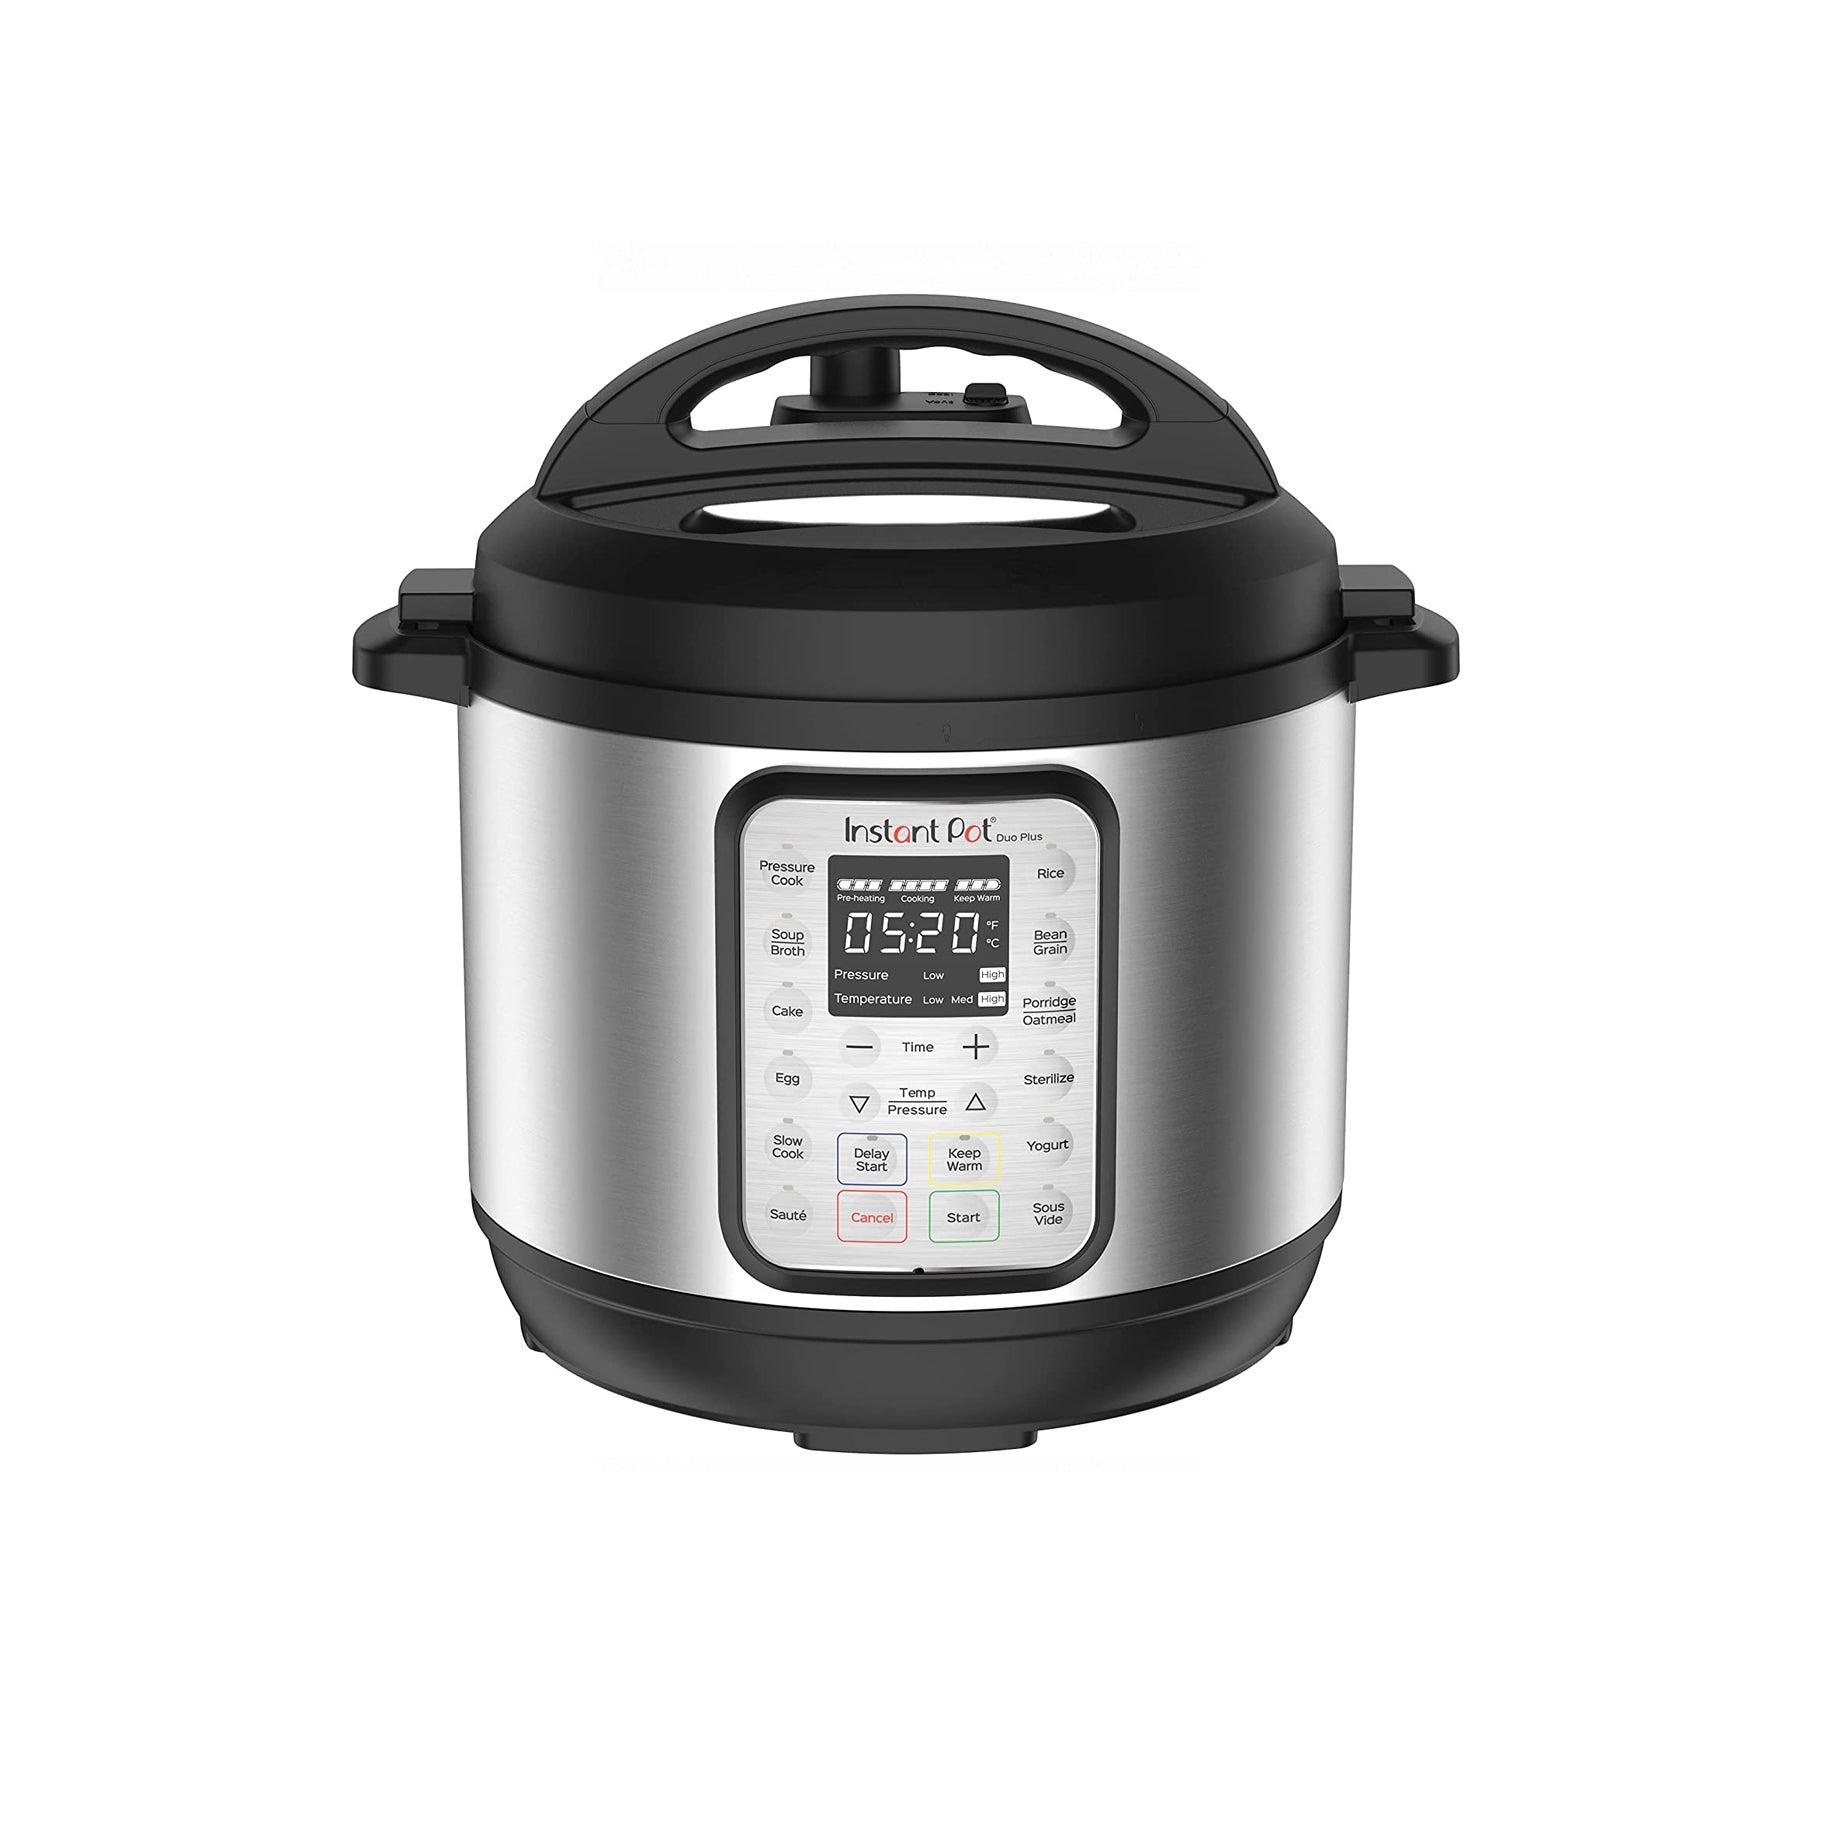 The Best Slow Cooker Option: Instant Pot Duo Plus 6-Quart 9-in-1 Slow Cooker